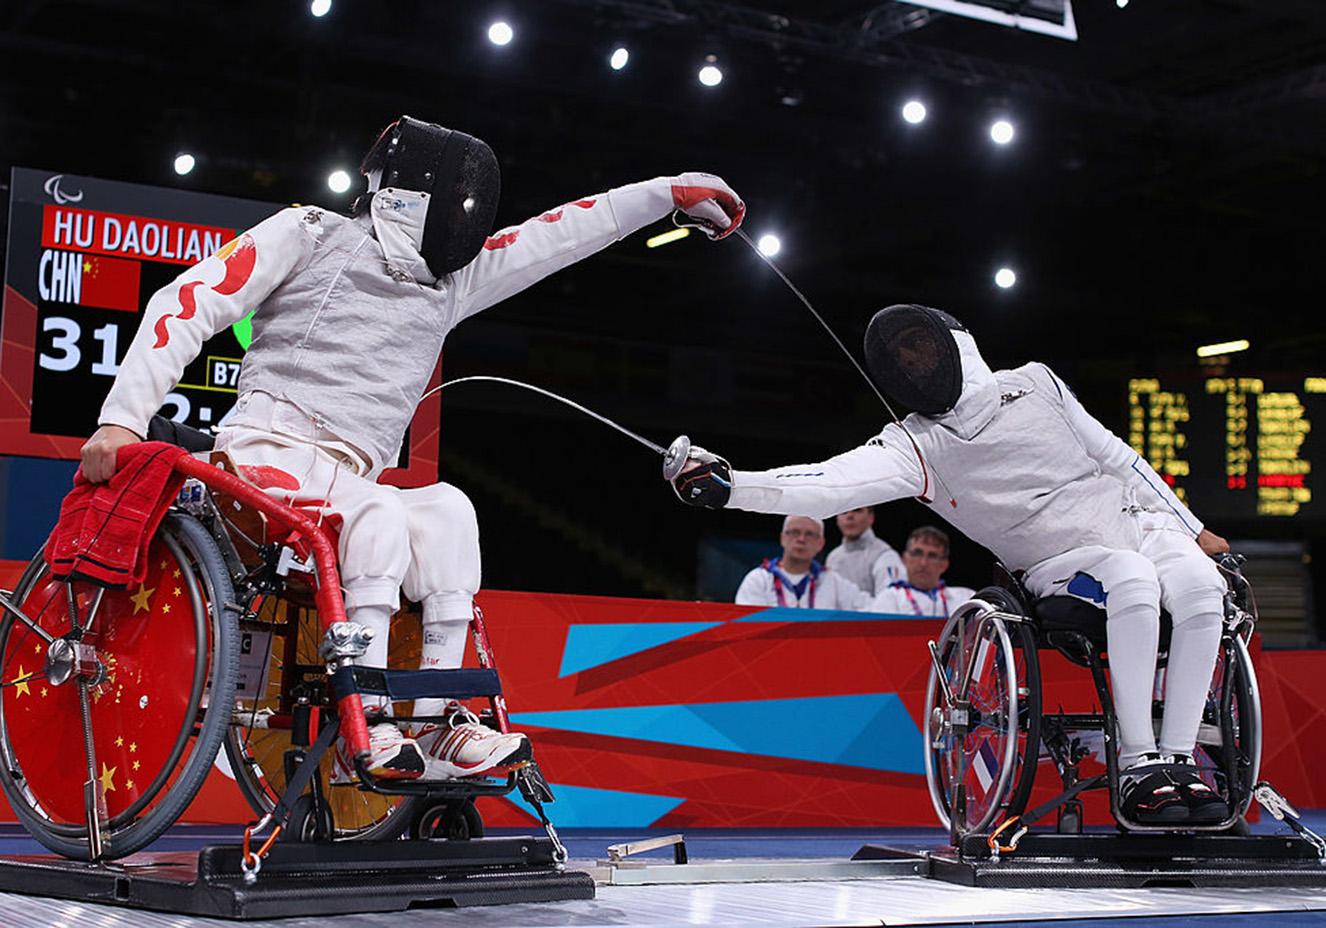 Dan Kitwood/Equipa/Getty Images